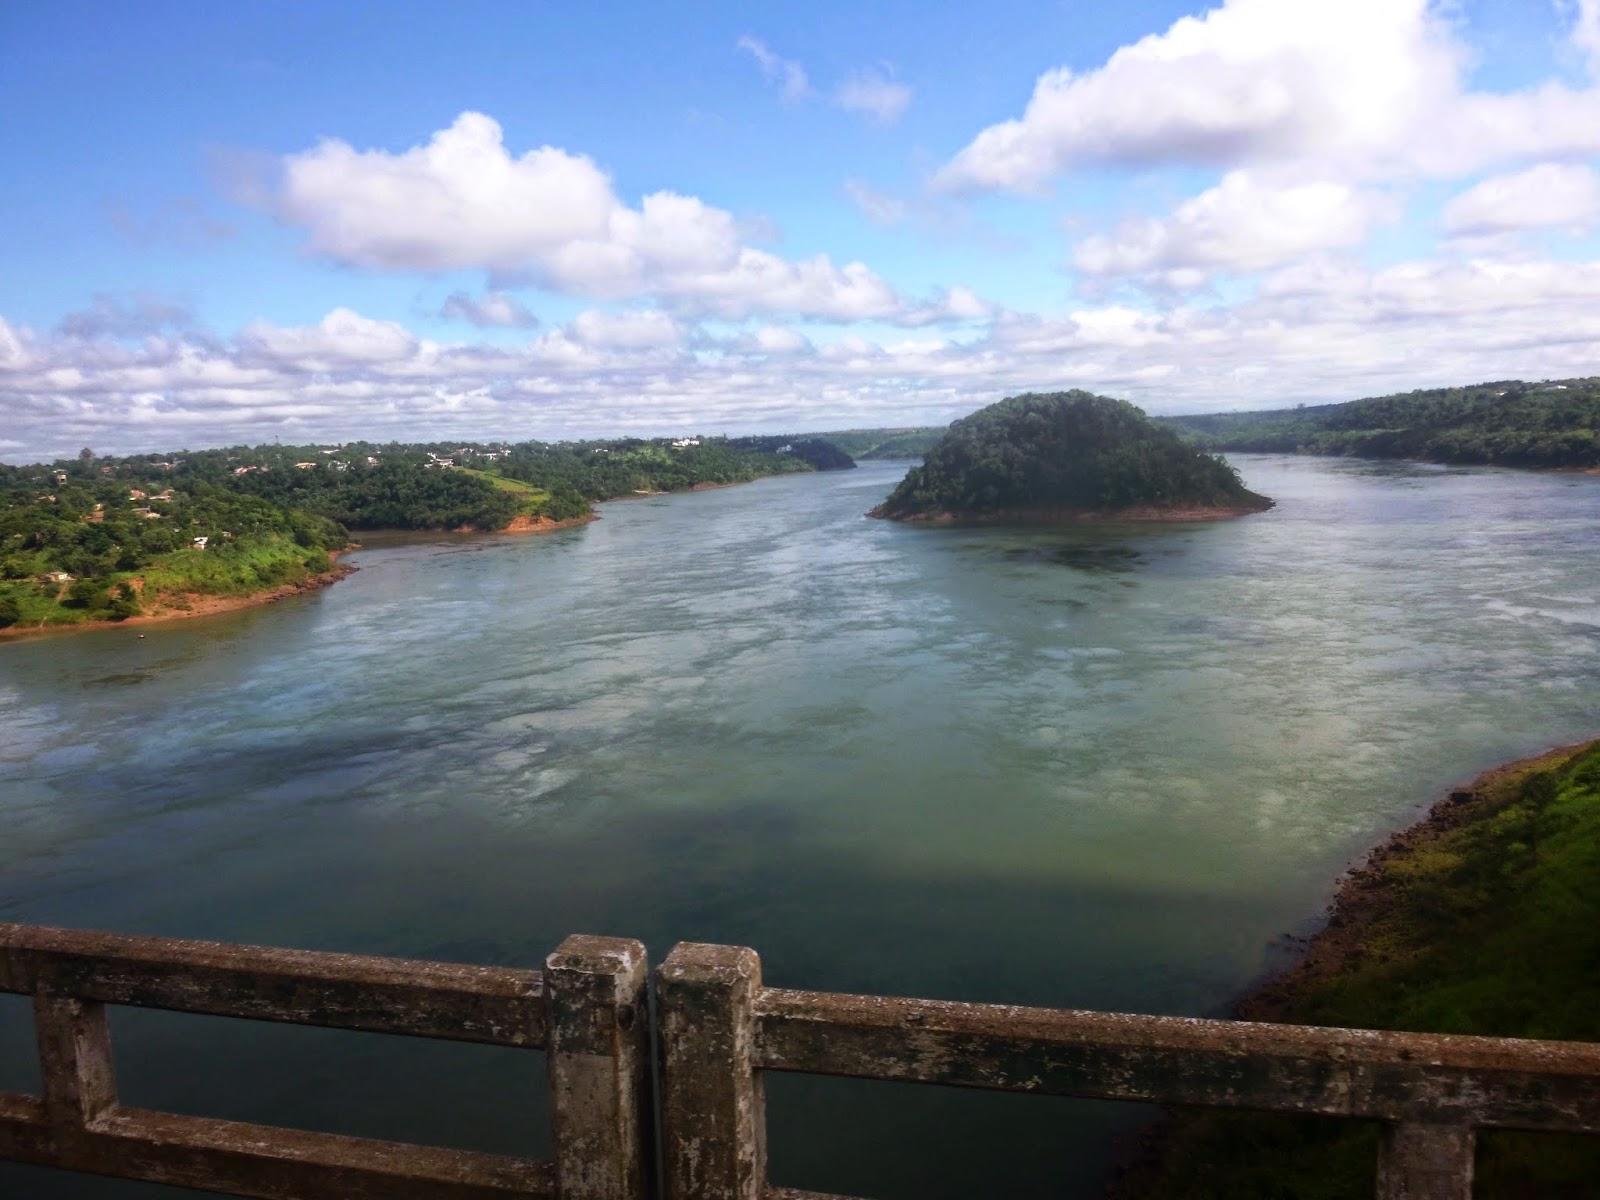 Ciudad del Este - Paraguai - Foz do Iguaçu-PR